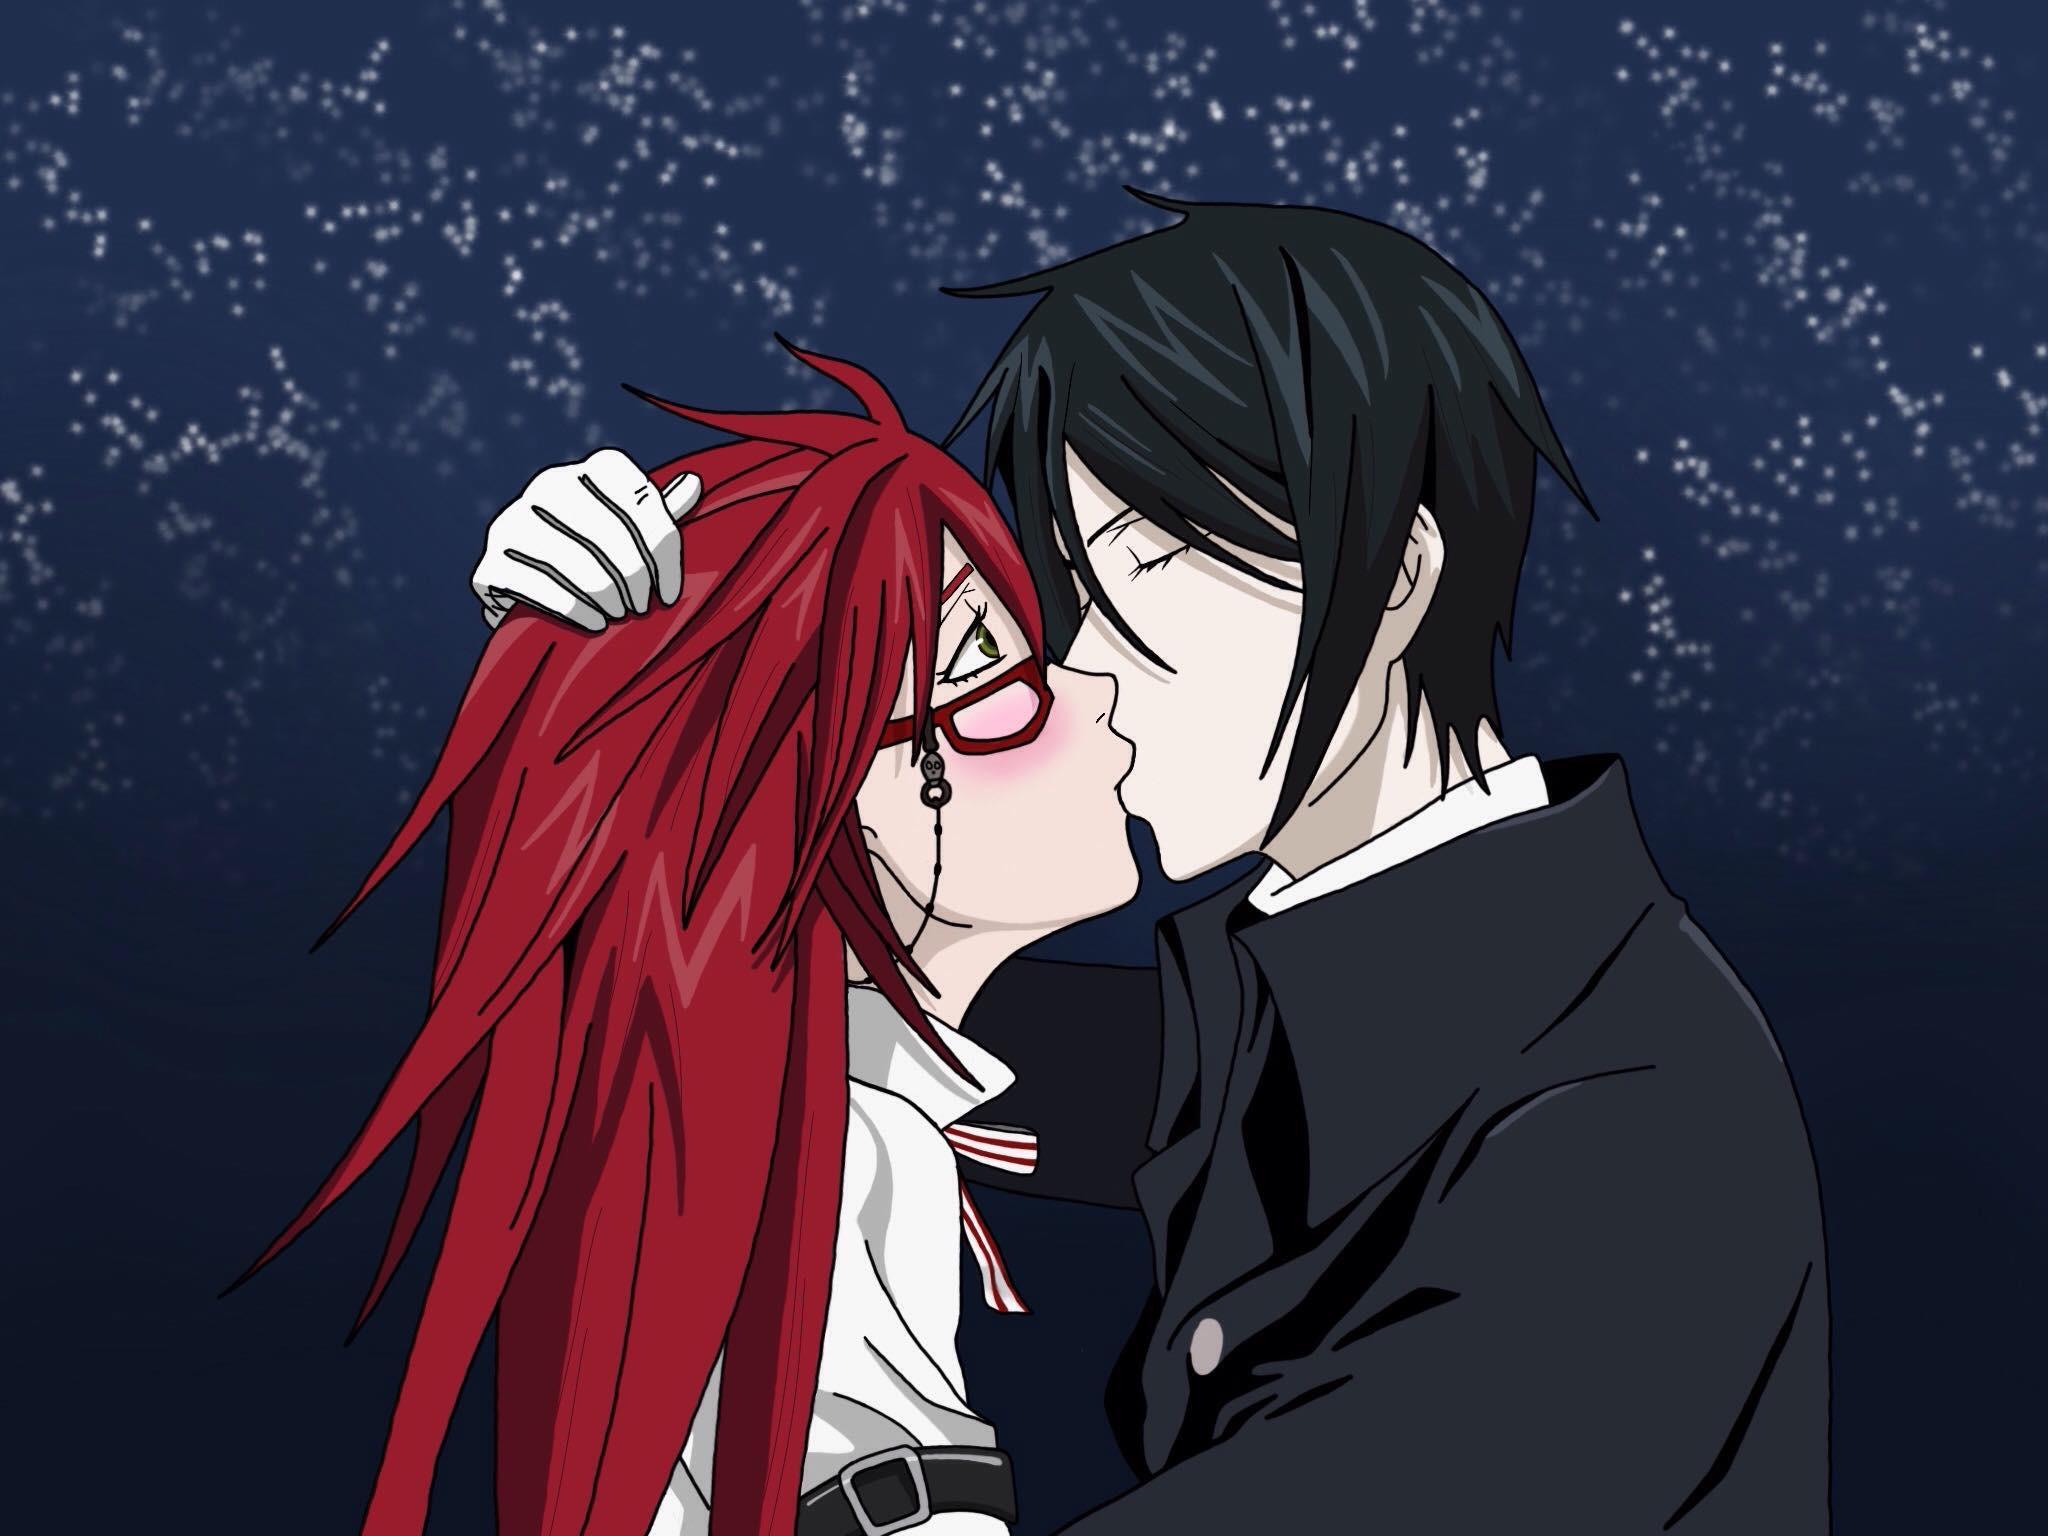 Sebagrell Kiss